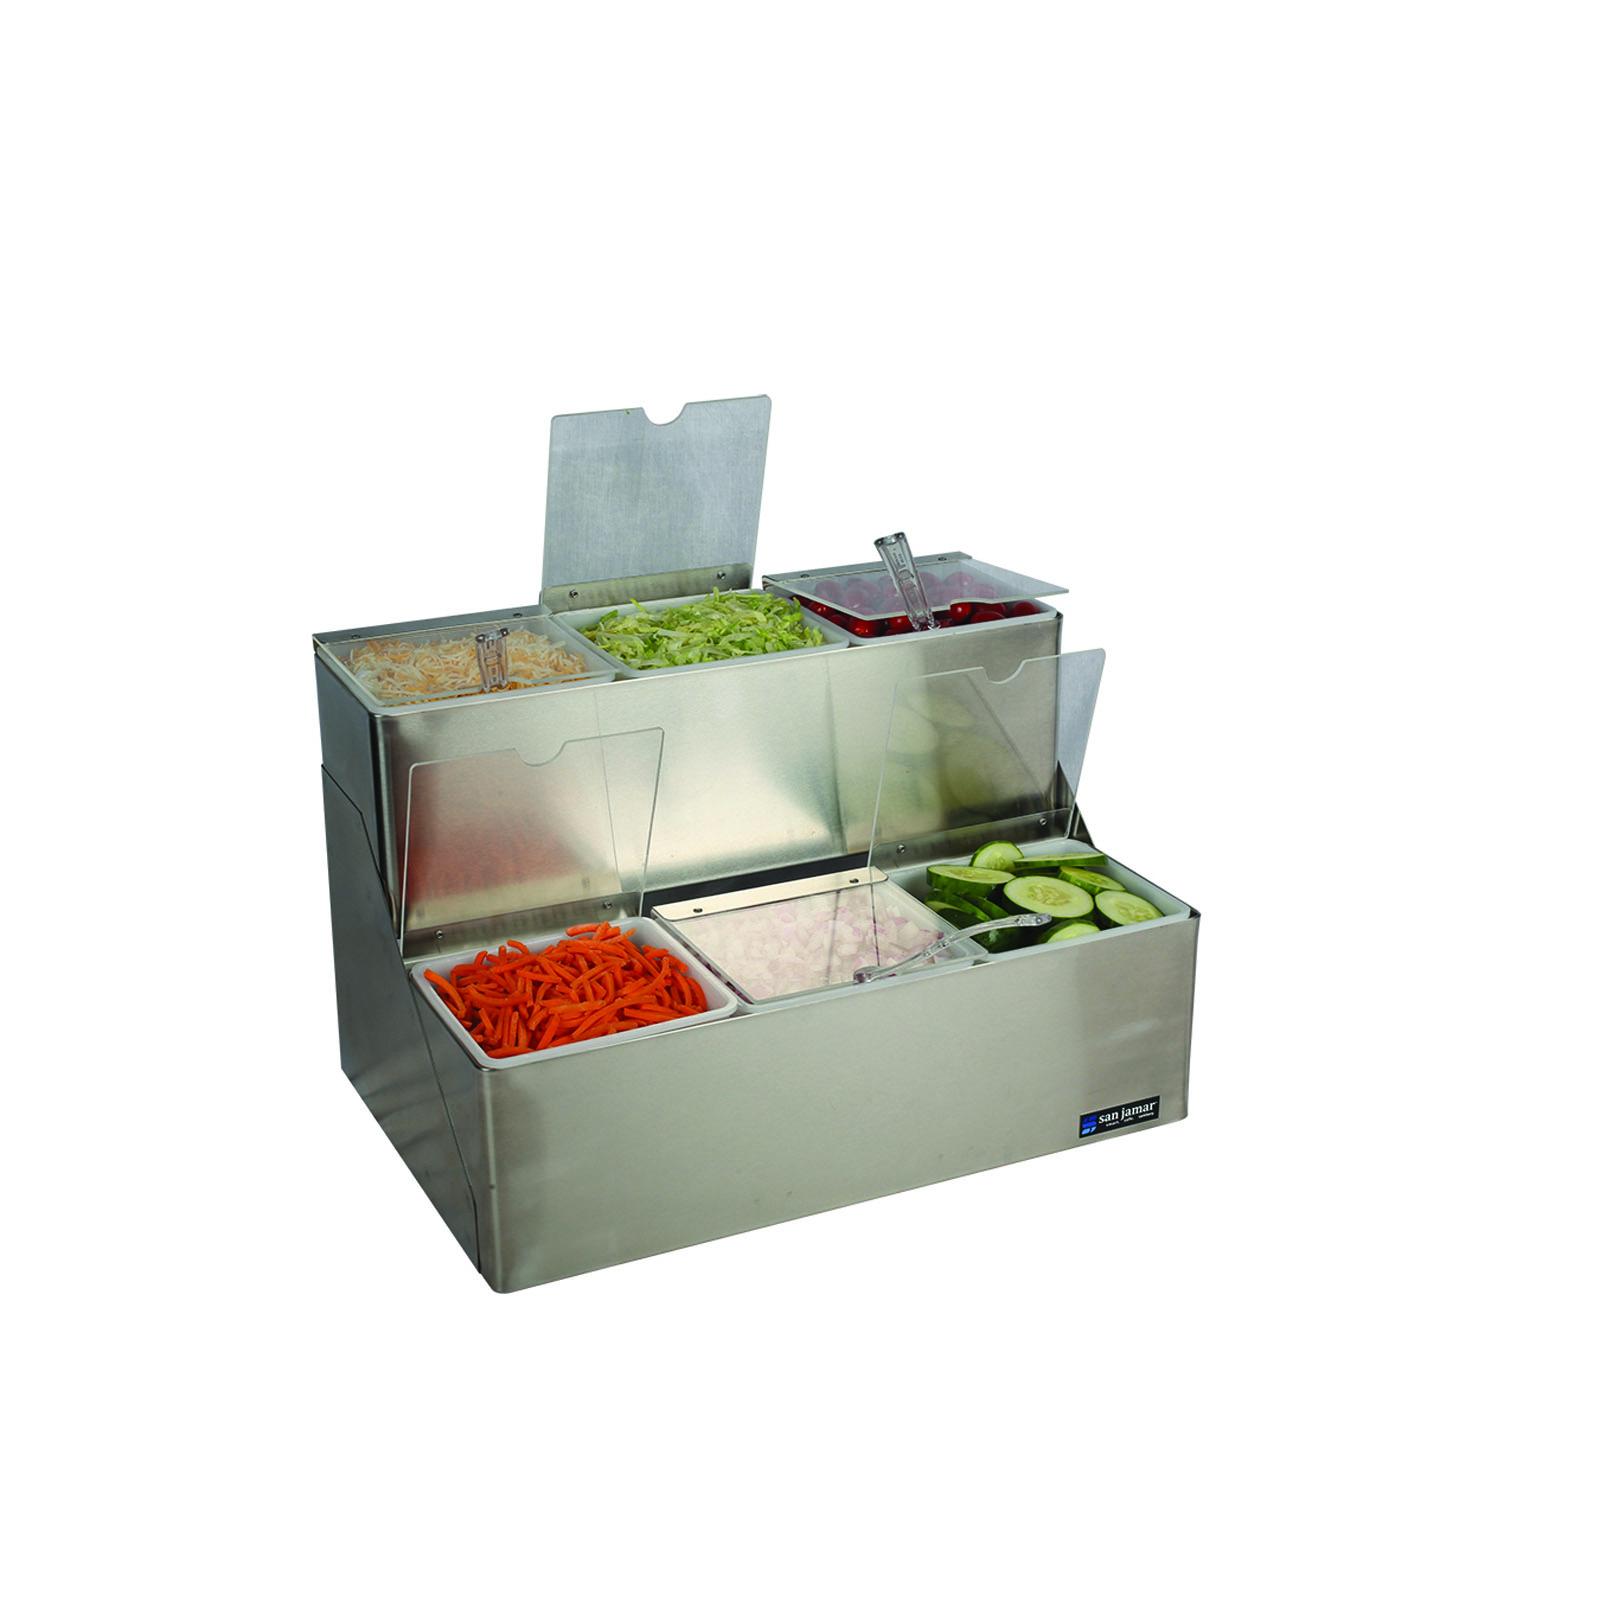 San Jamar B6706INL condiment caddy, countertop organizer